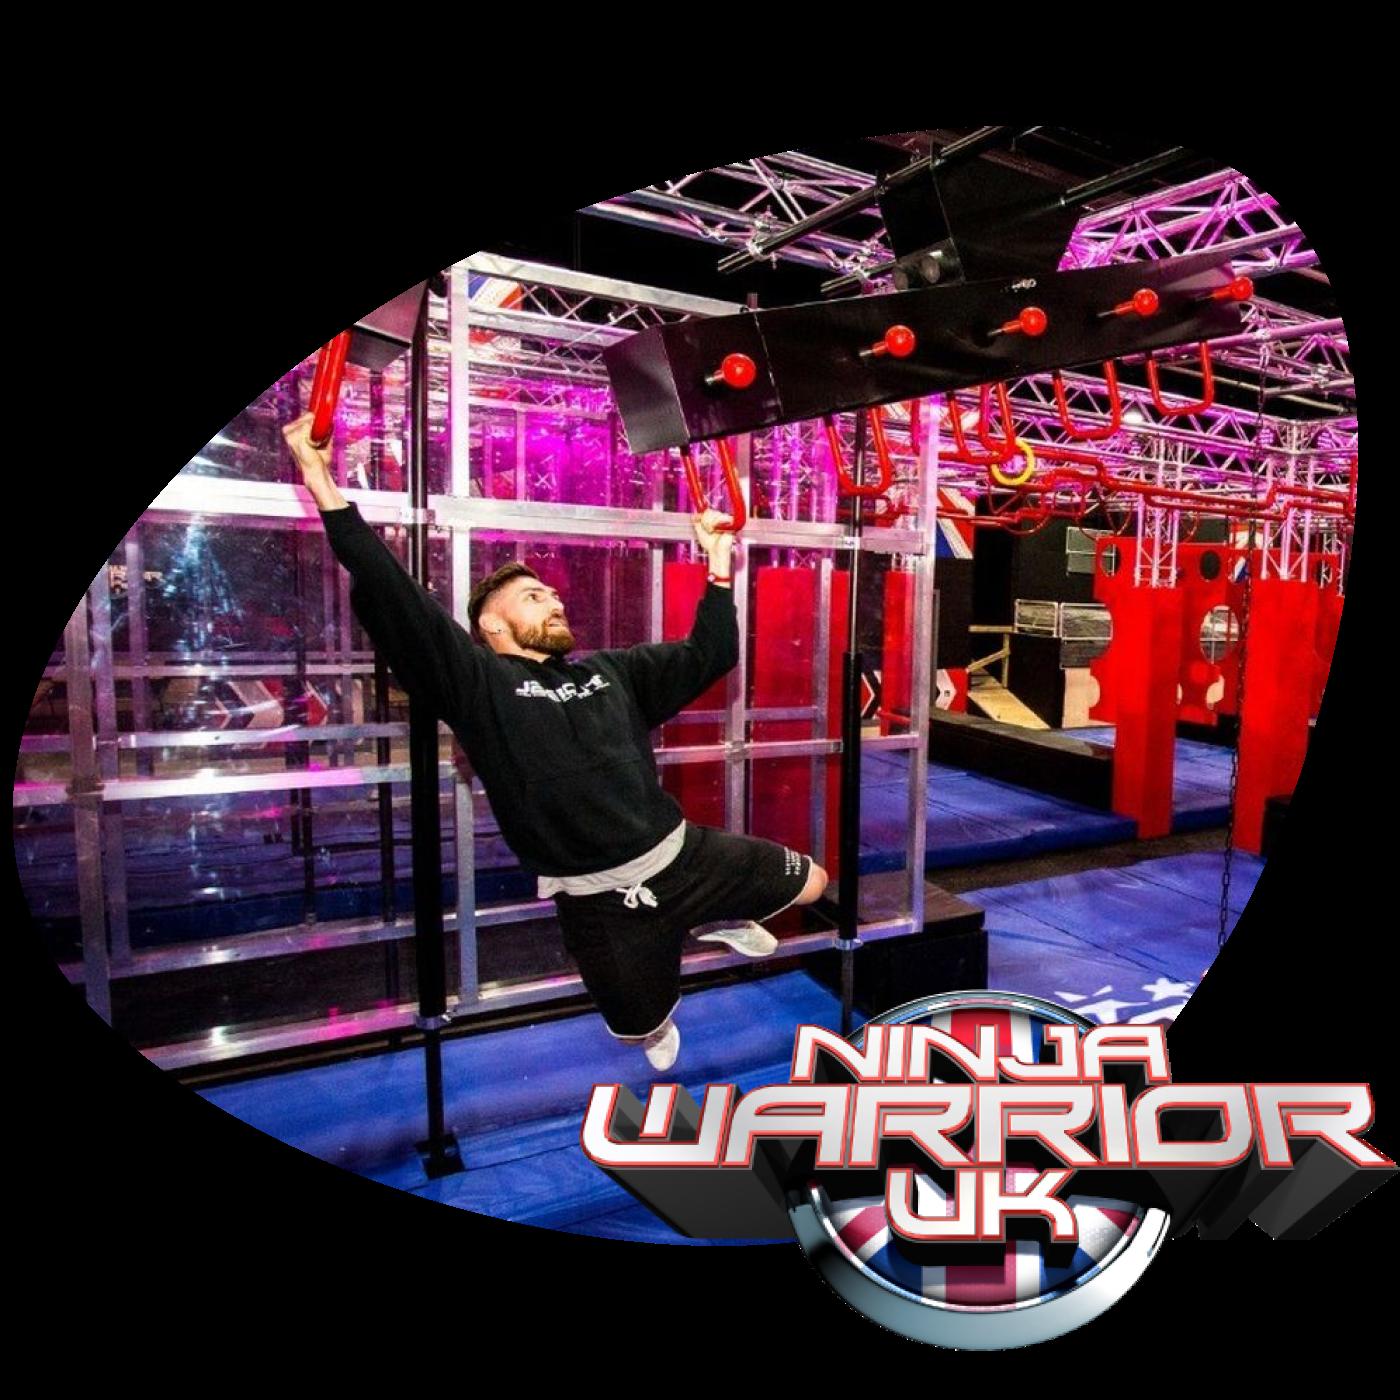 ninja warrior-1